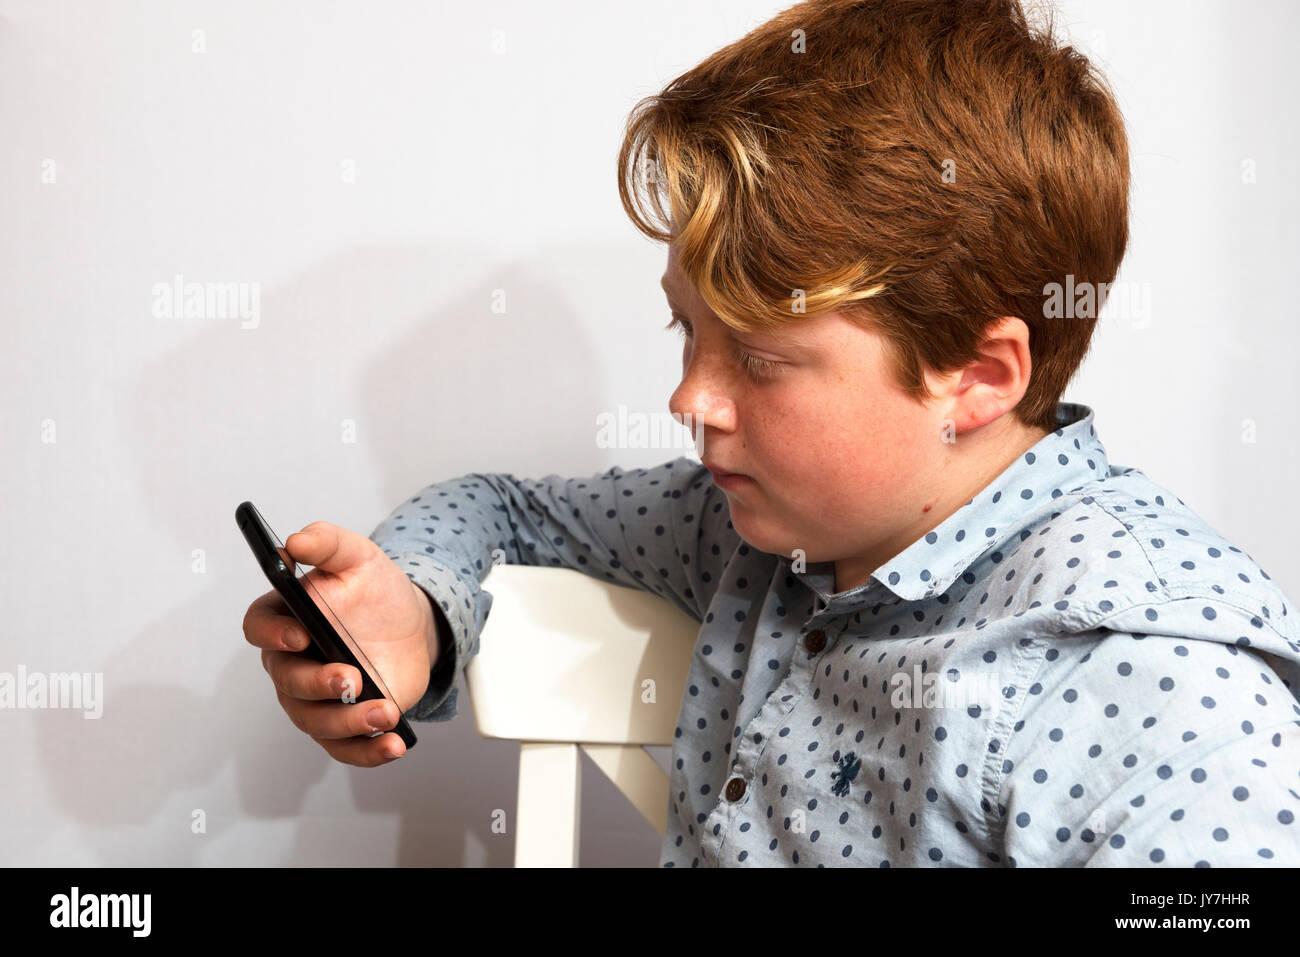 11-jähriger Junge mit Smartphone Stockbild